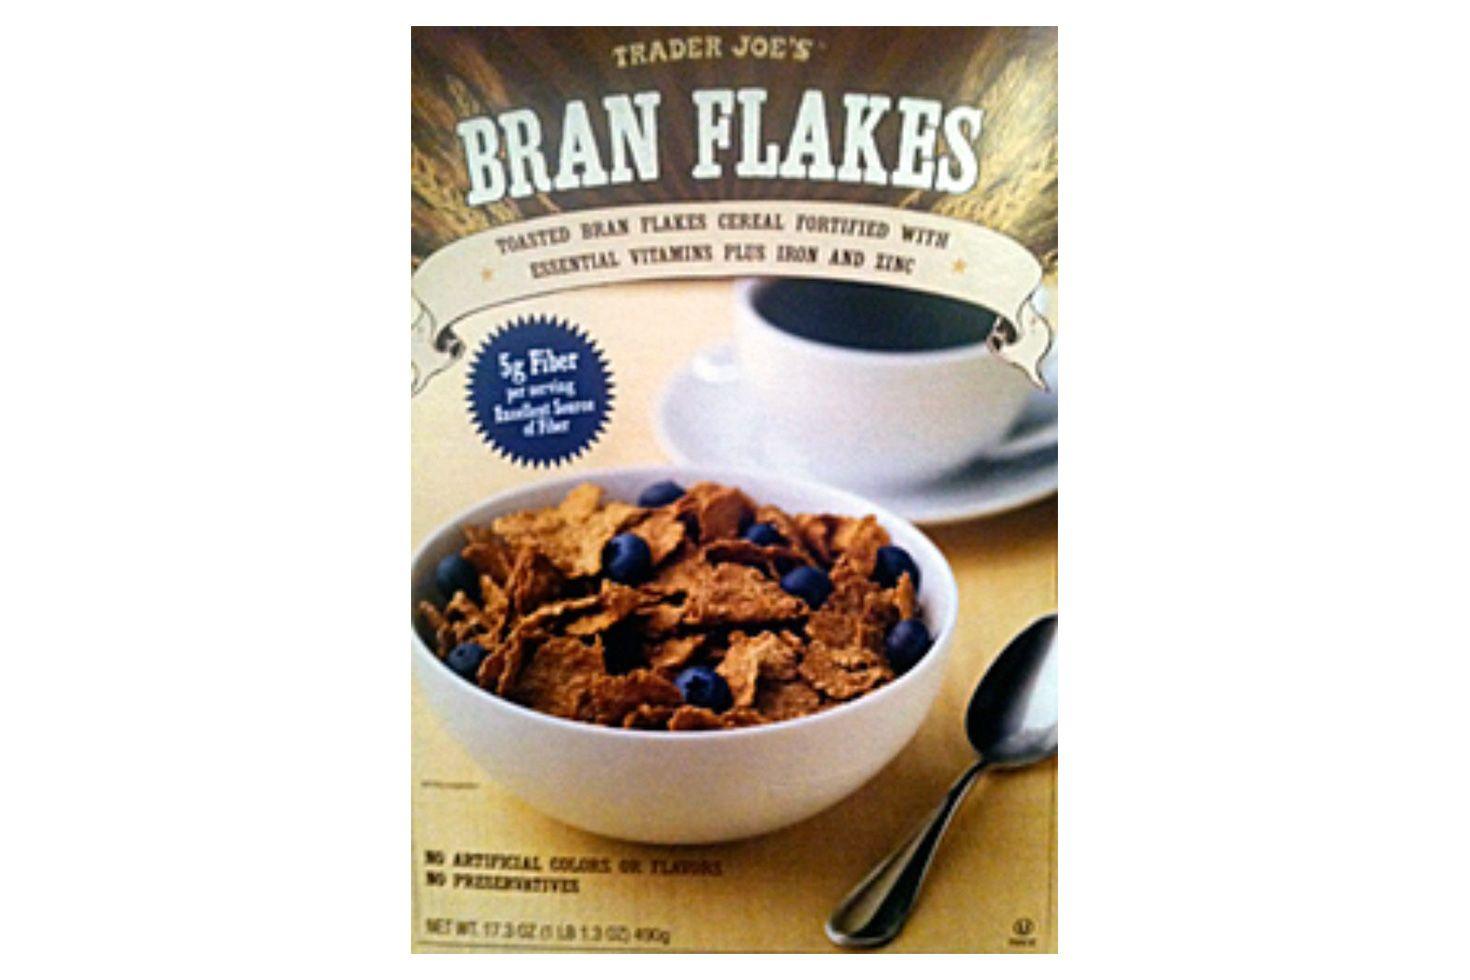 Trader Joe's Bran Flakes